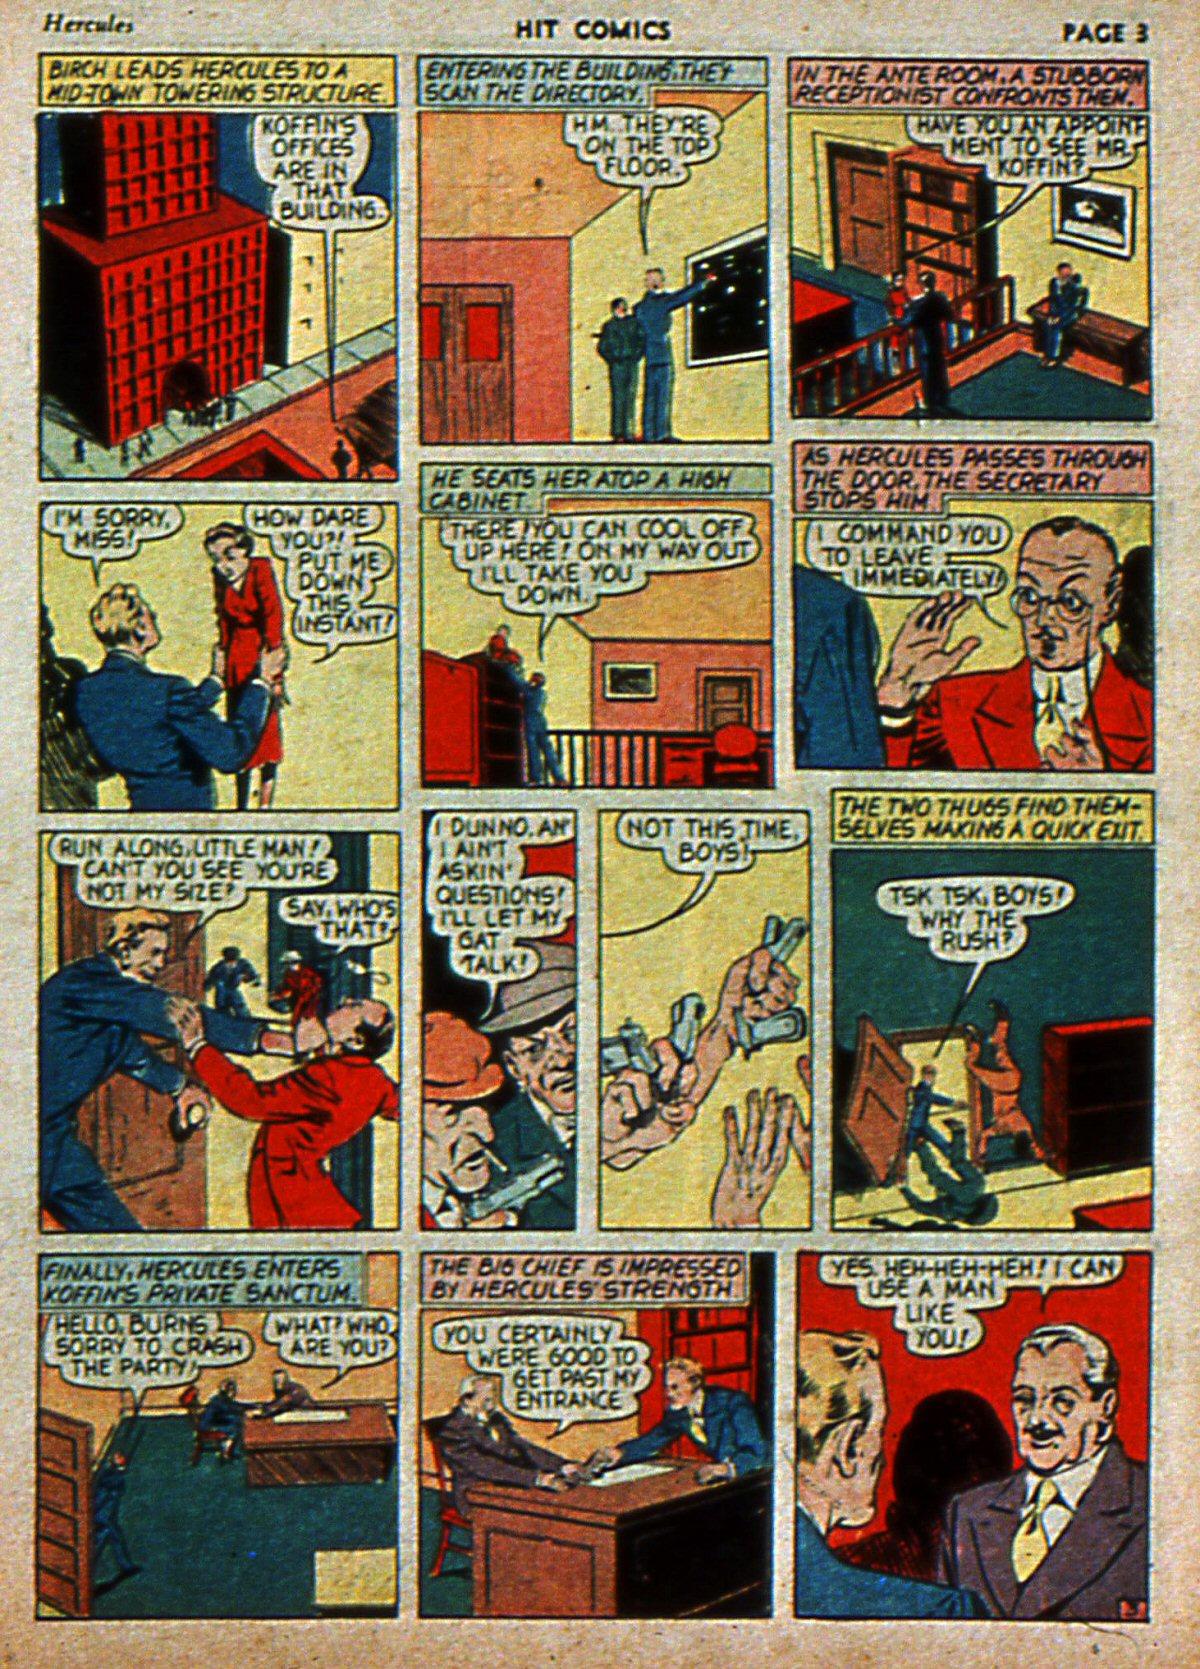 Read online Hit Comics comic -  Issue #3 - 5